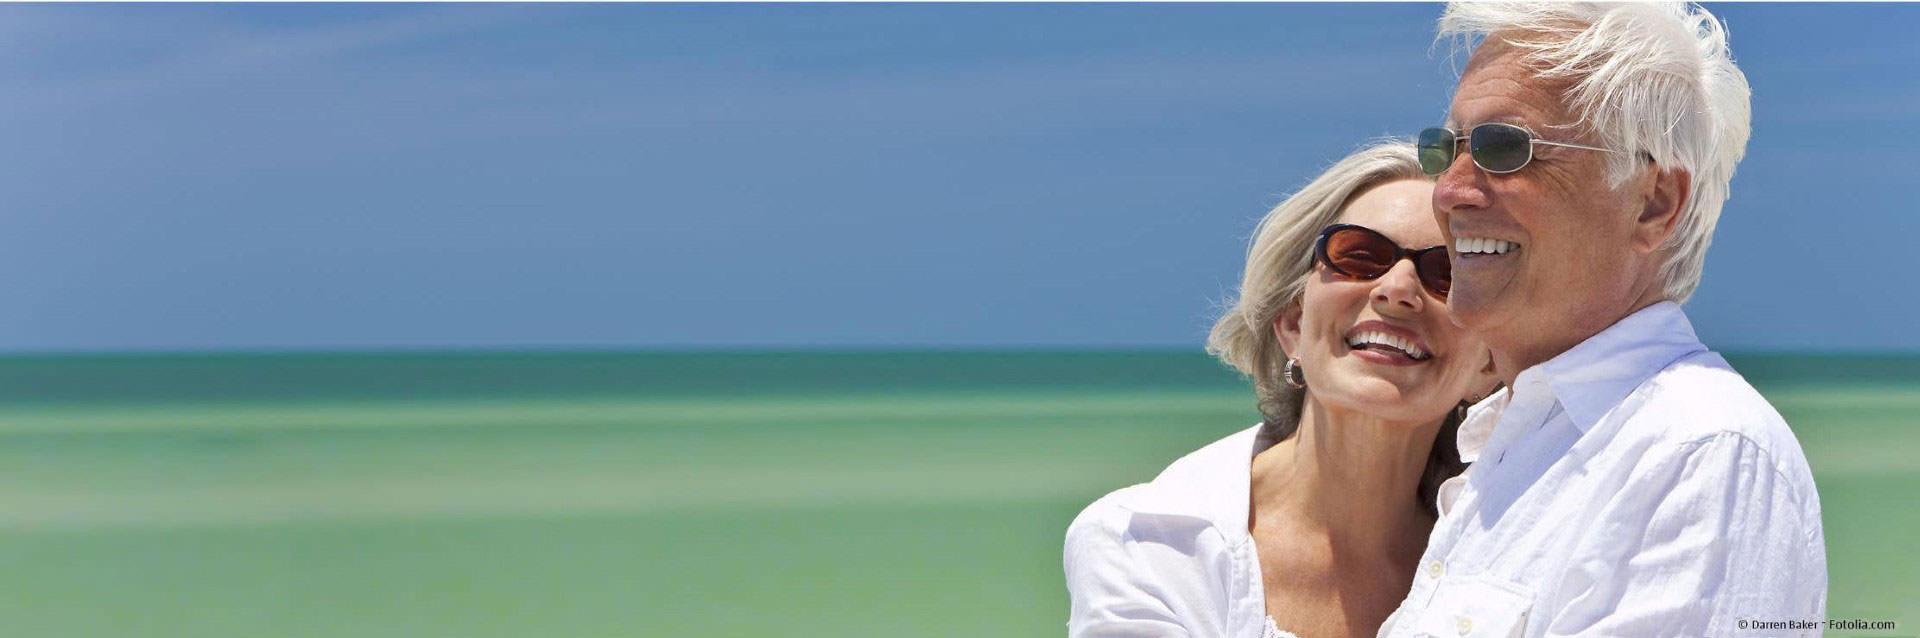 Parodontitis-Behandlung in Eichenau